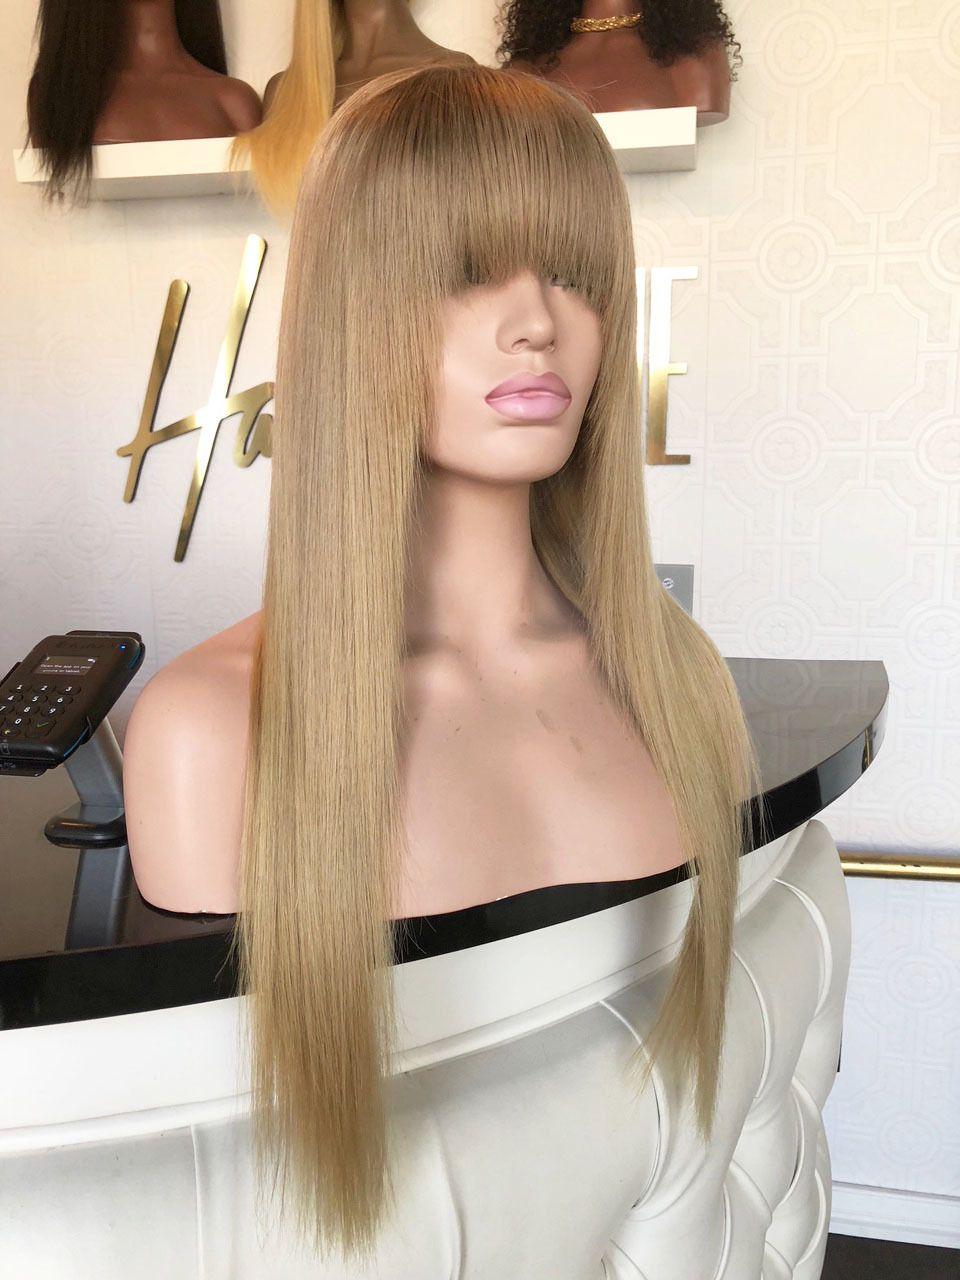 Sassy (With images) | Sassy hair, Long hair styles, Wig ...